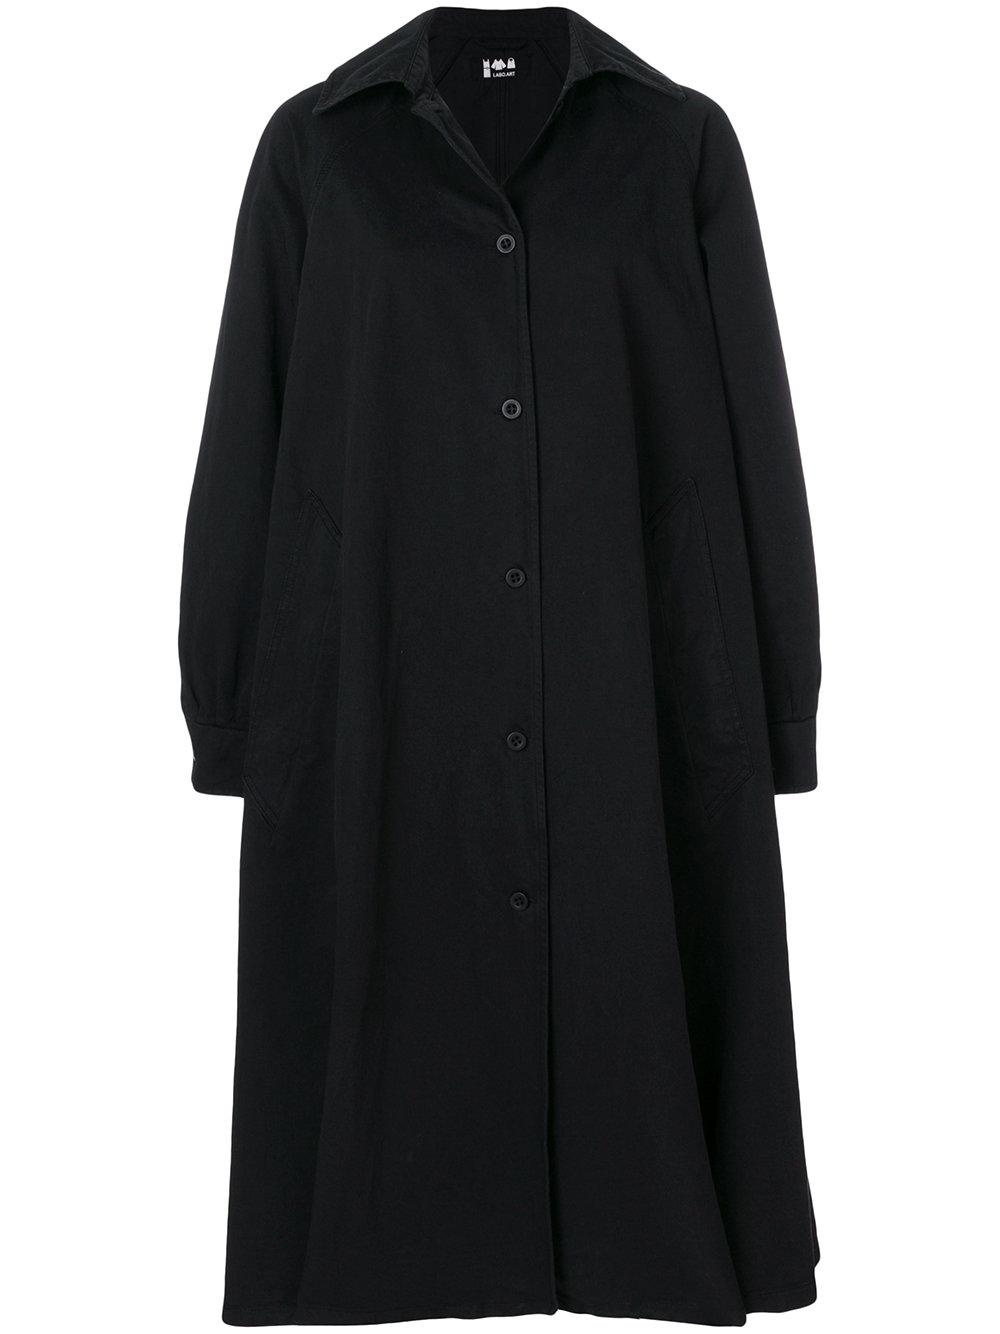 Labo Art Oversized Coat